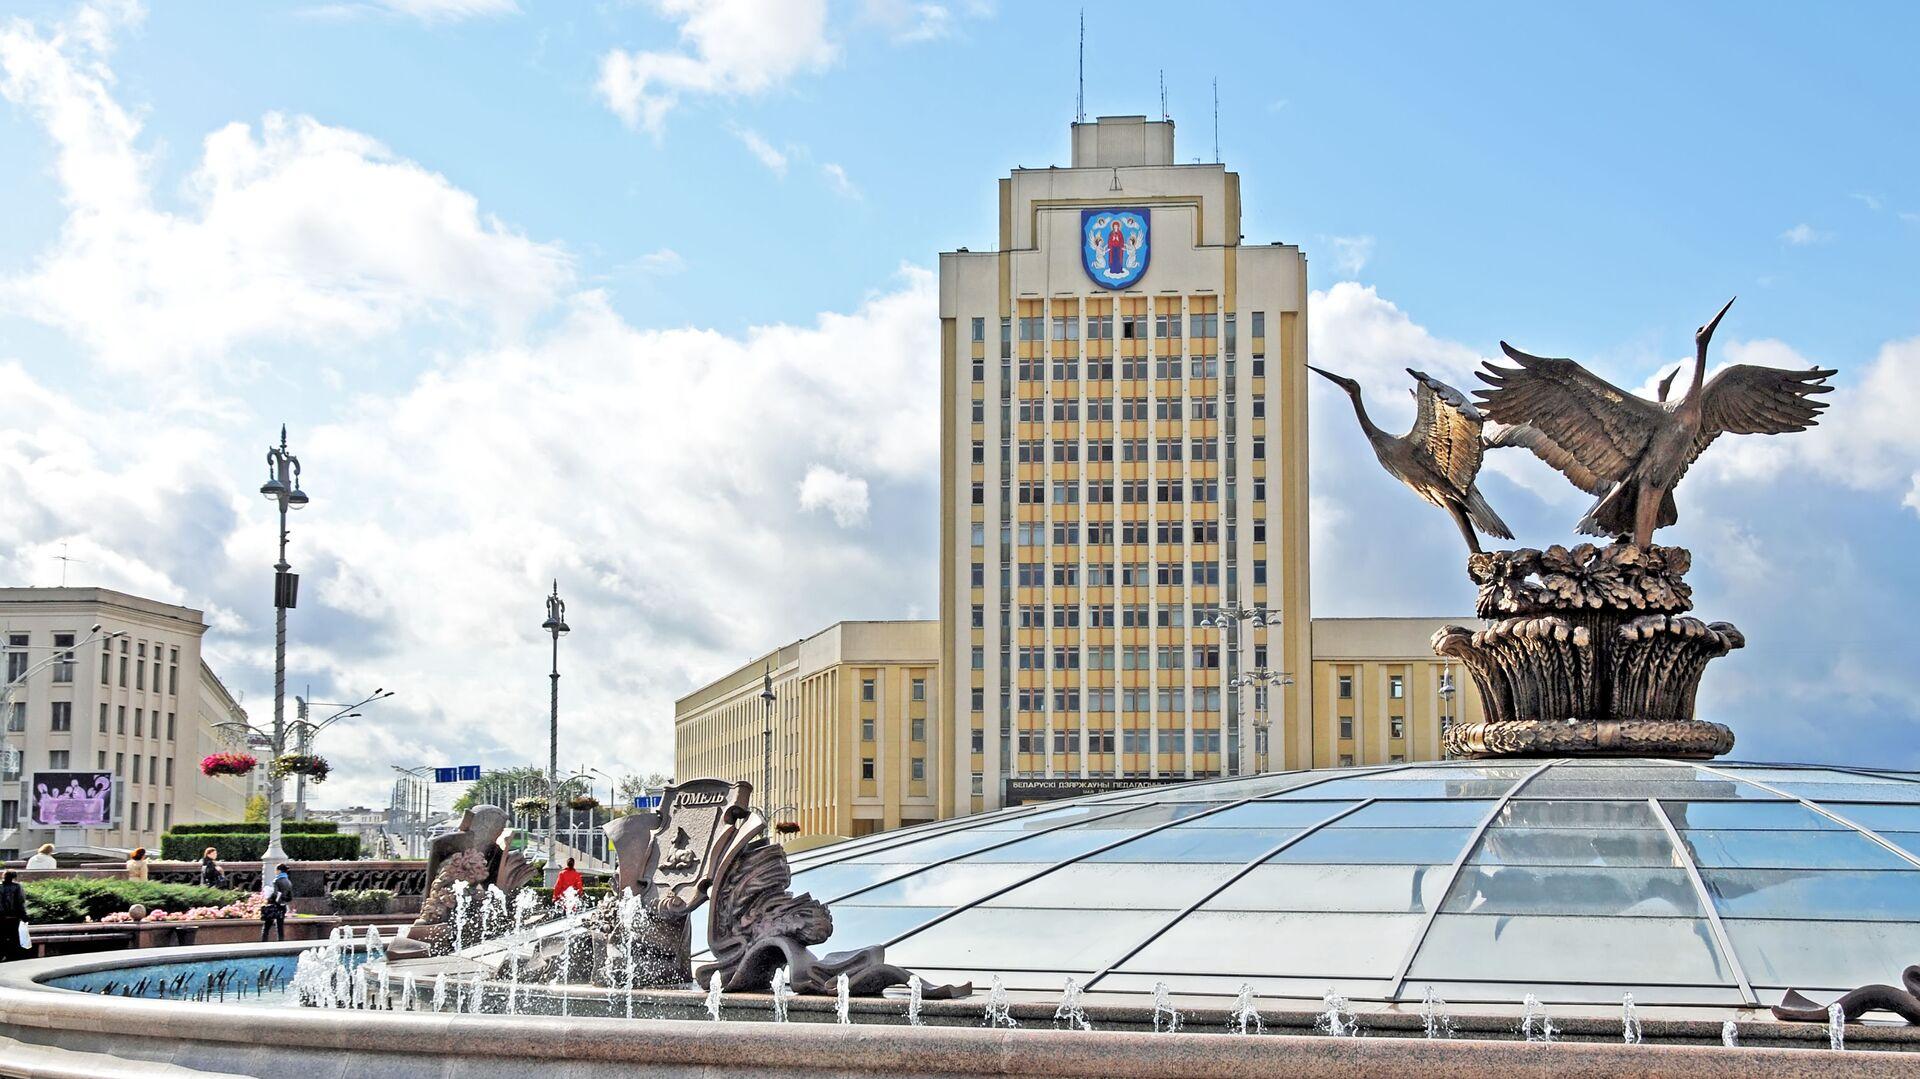 Площадь Независимости в Минске, Белоруссия - Sputnik Србија, 1920, 18.08.2021